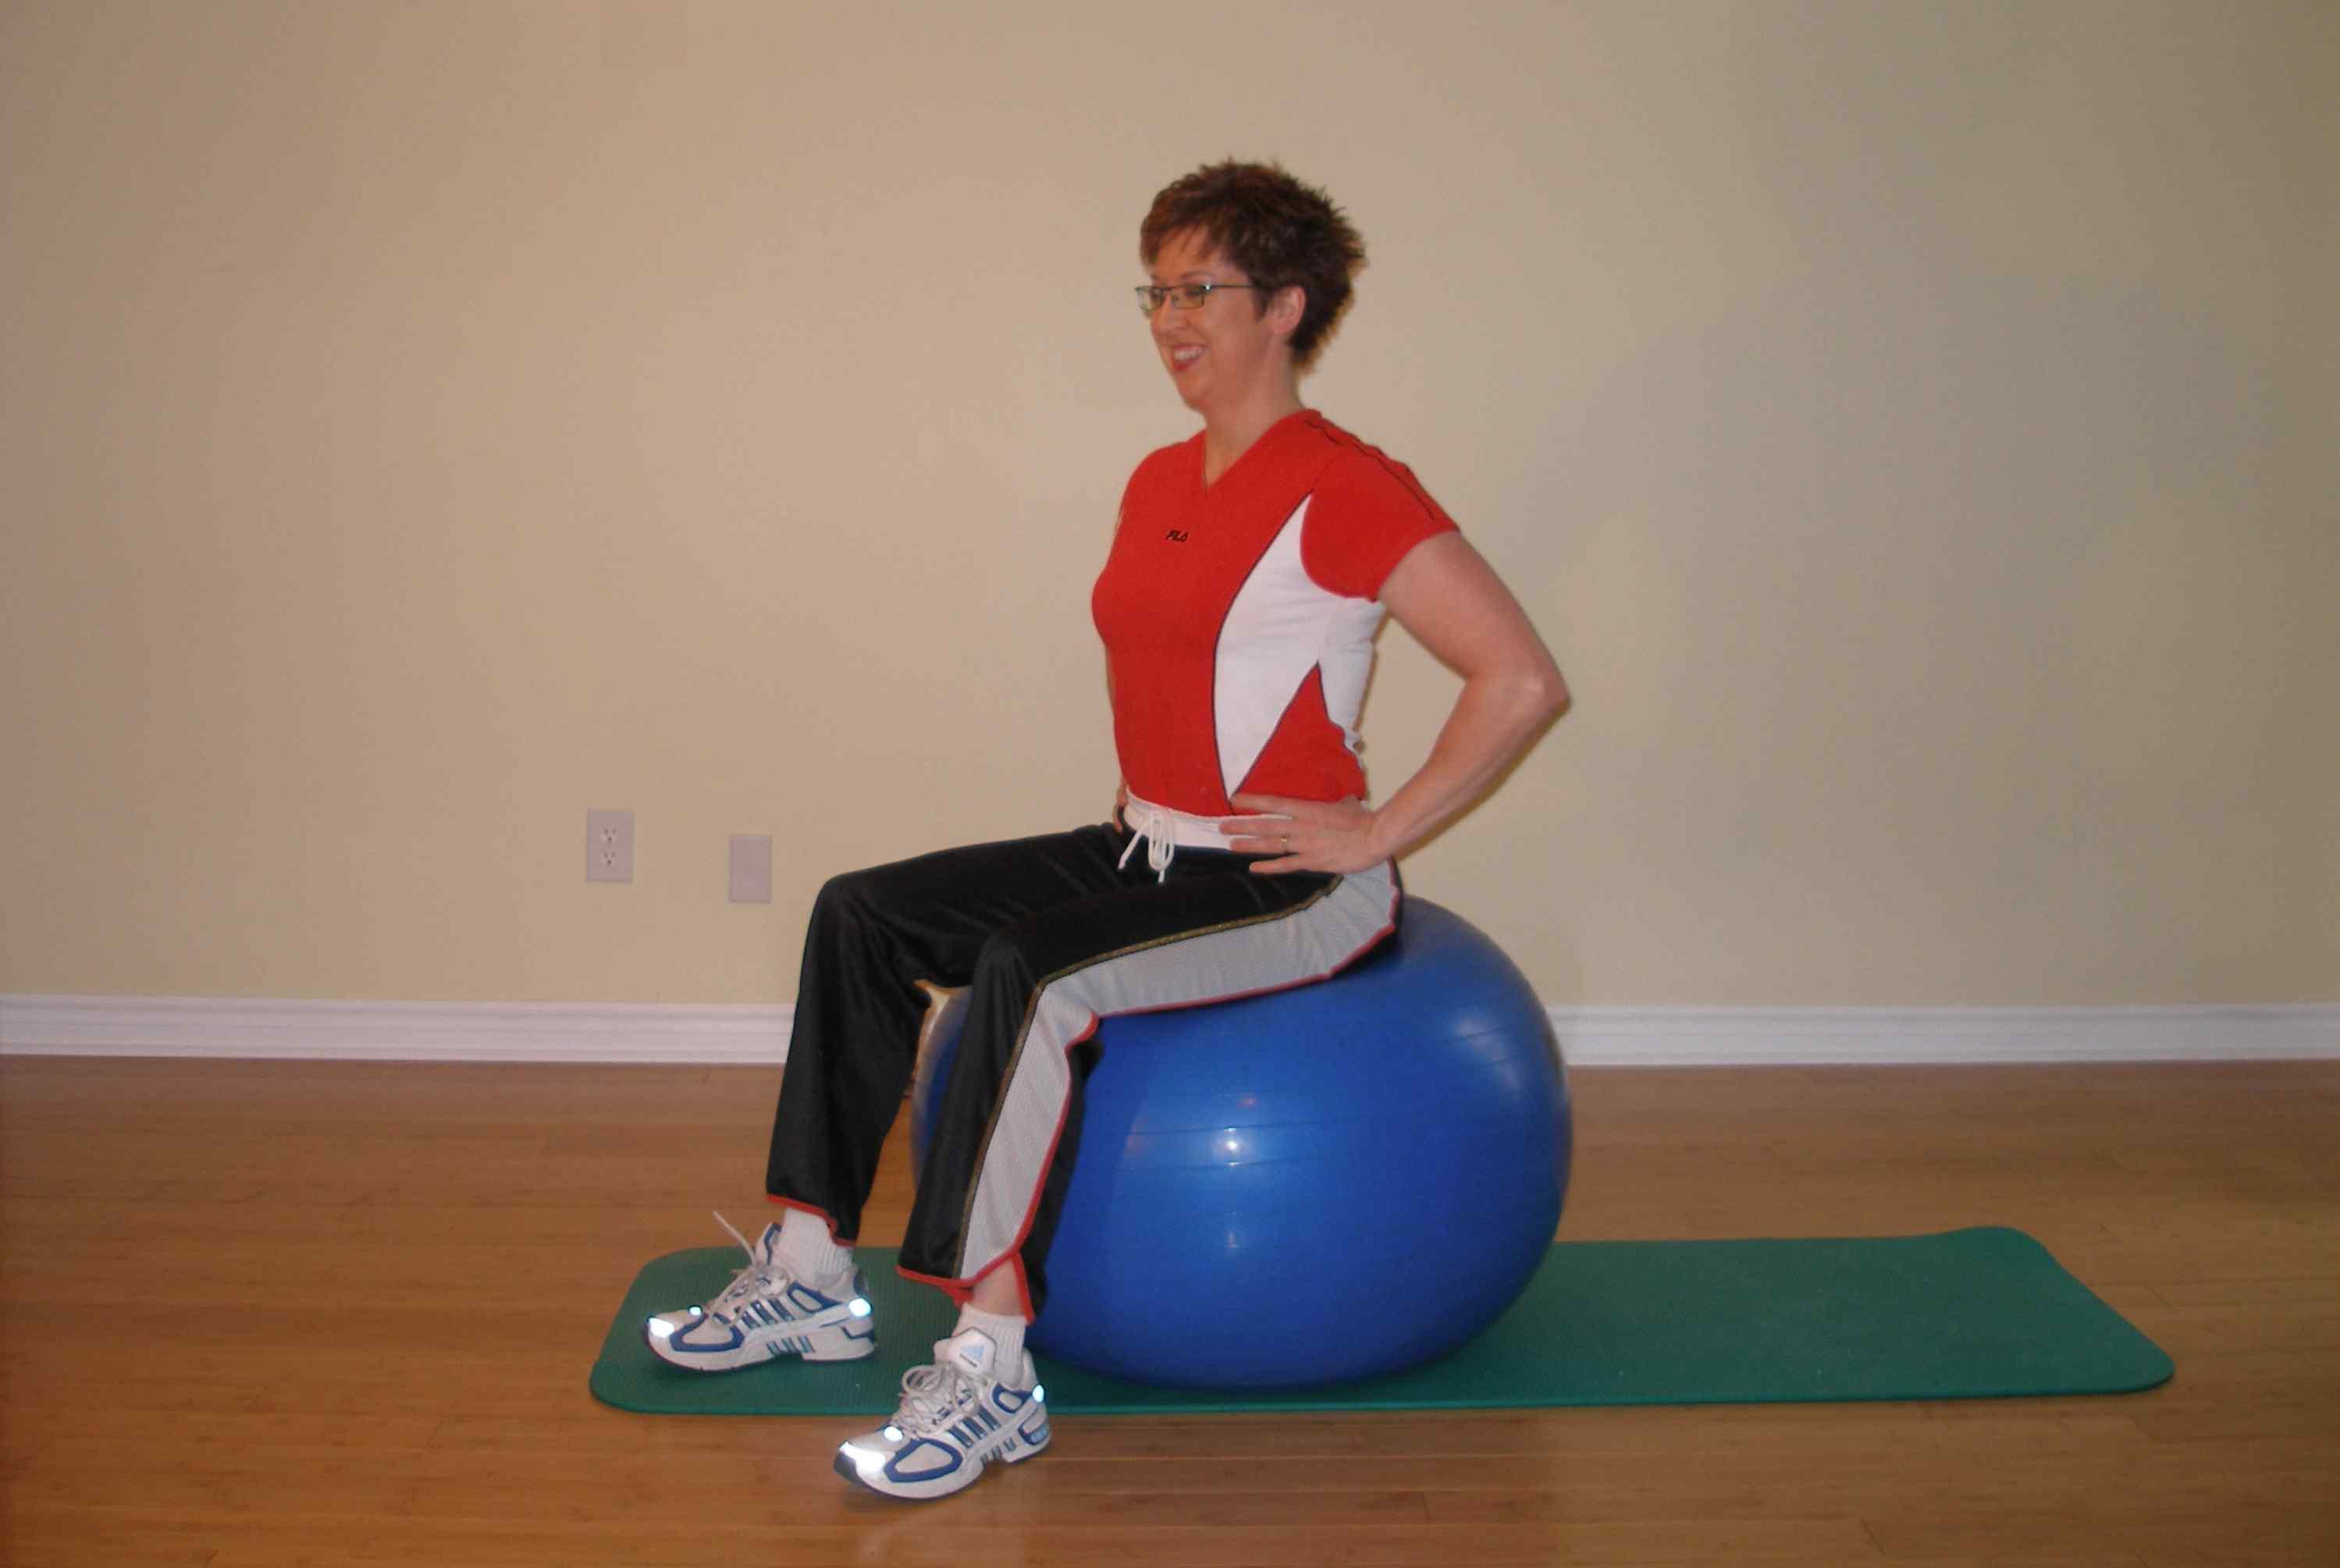 Seated leg raise on the exercise ball start